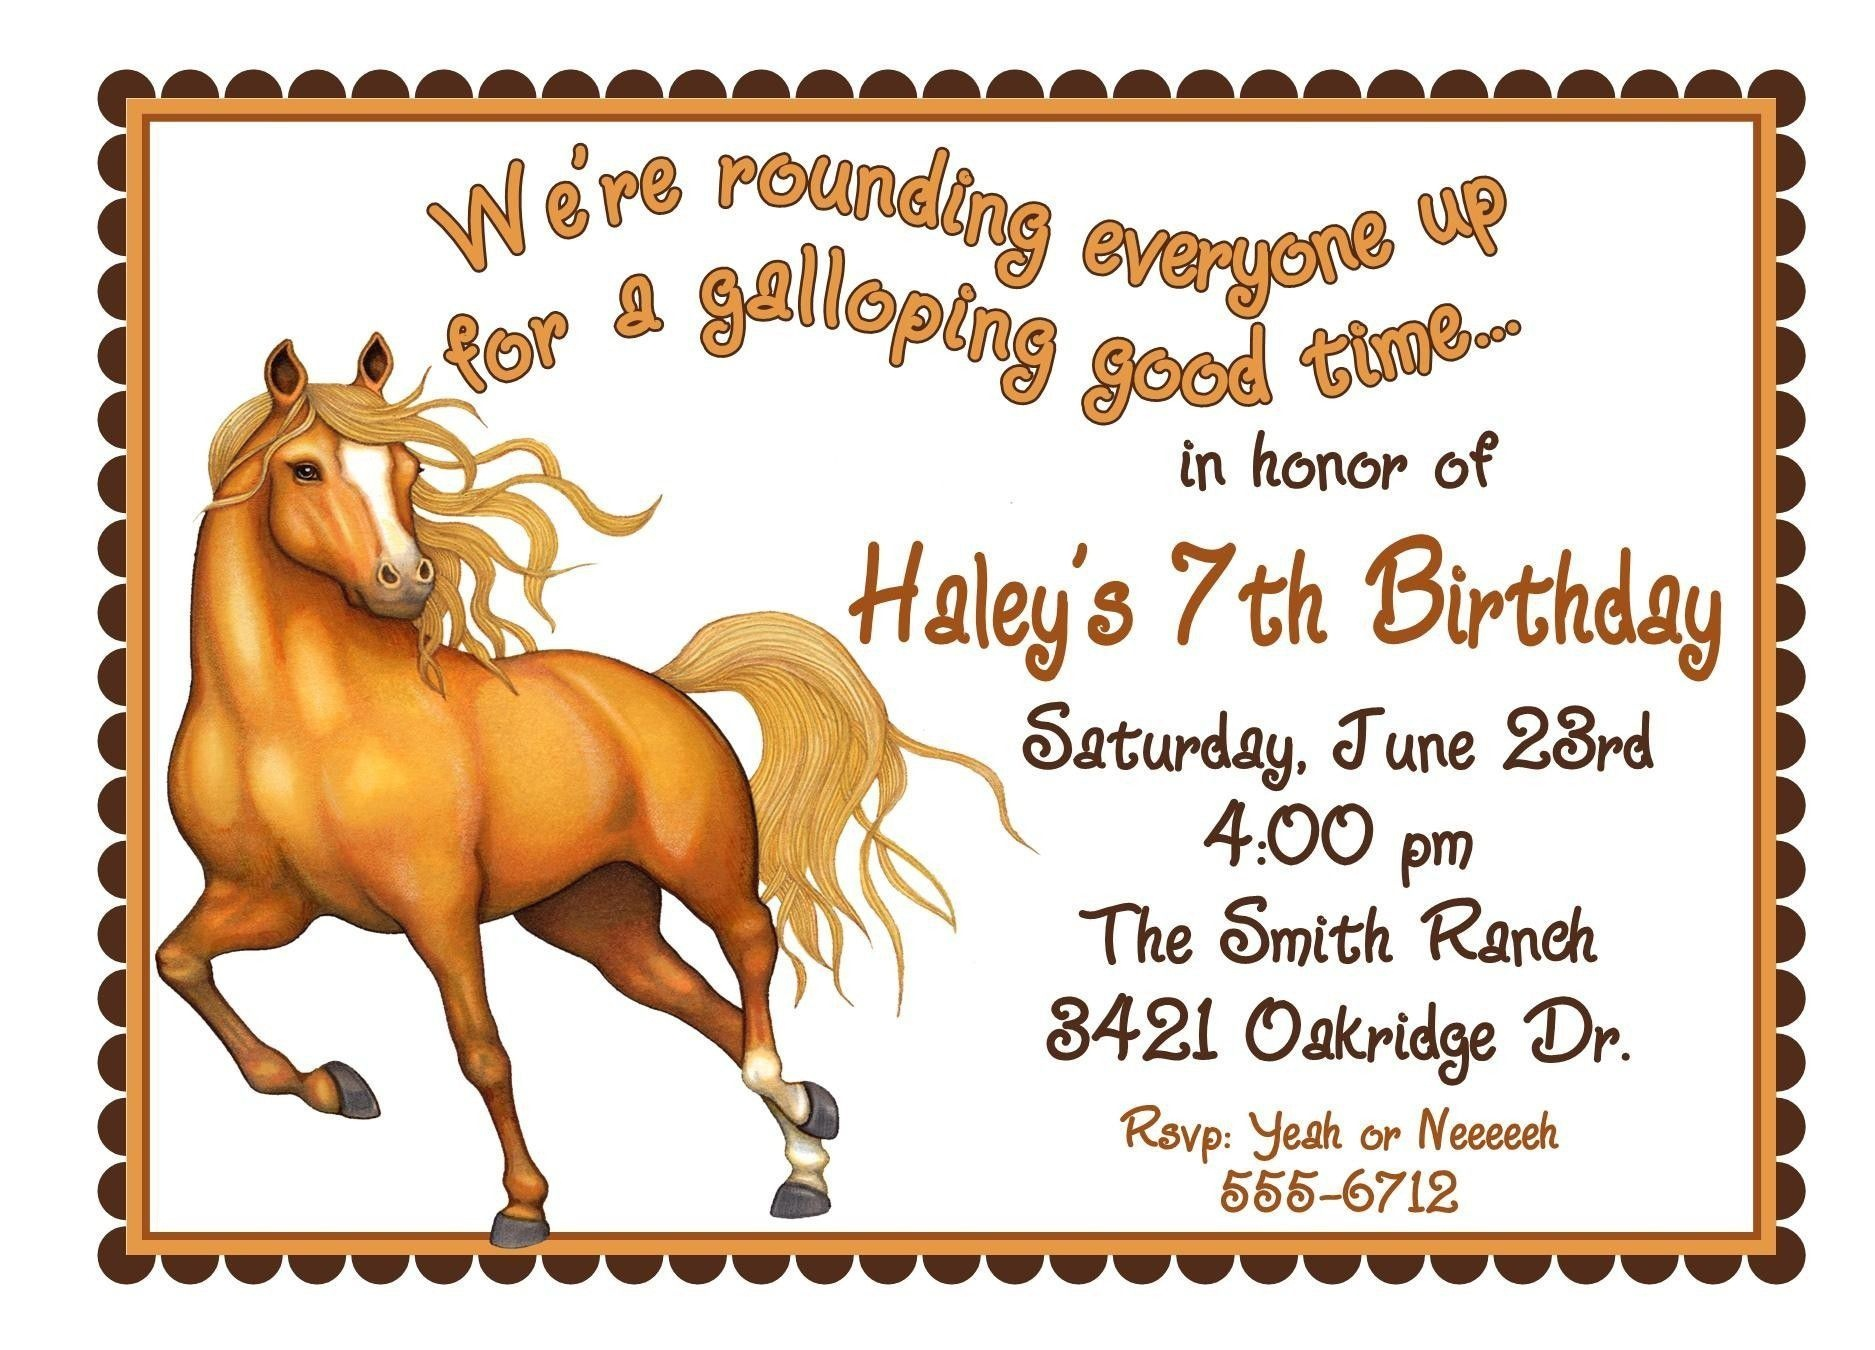 Free Printable Horse Birthday Invitations | Birthday Invitations - Free Printable Horse Themed Birthday Party Invitations